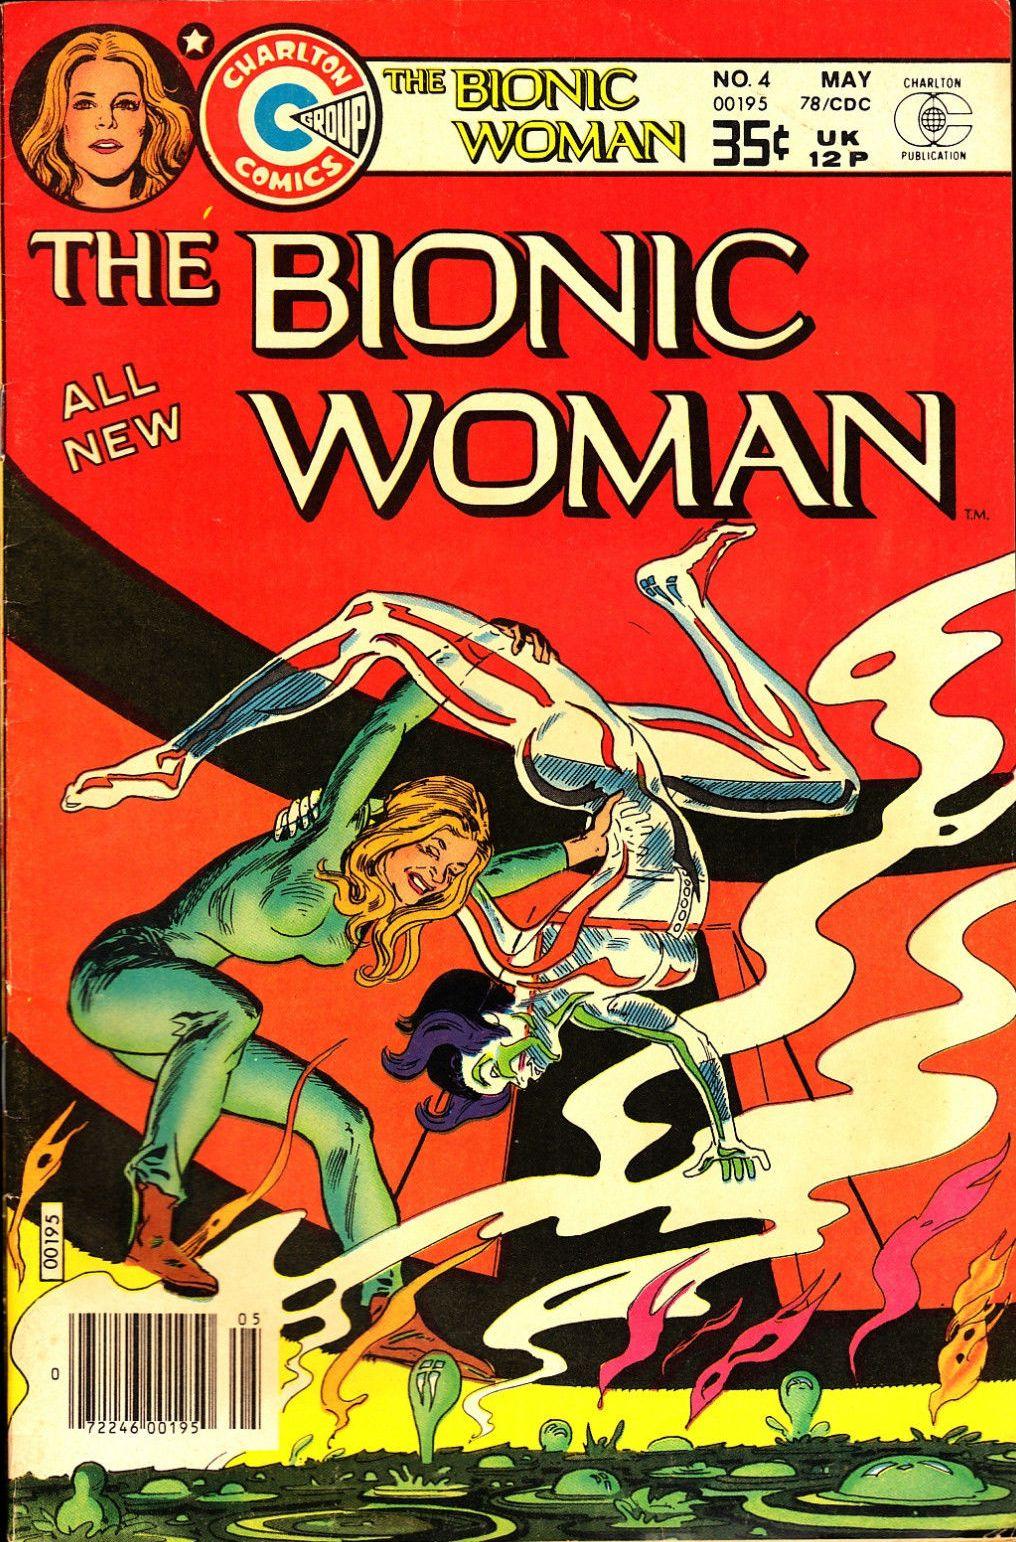 The Bionic Woman Vol 1 4